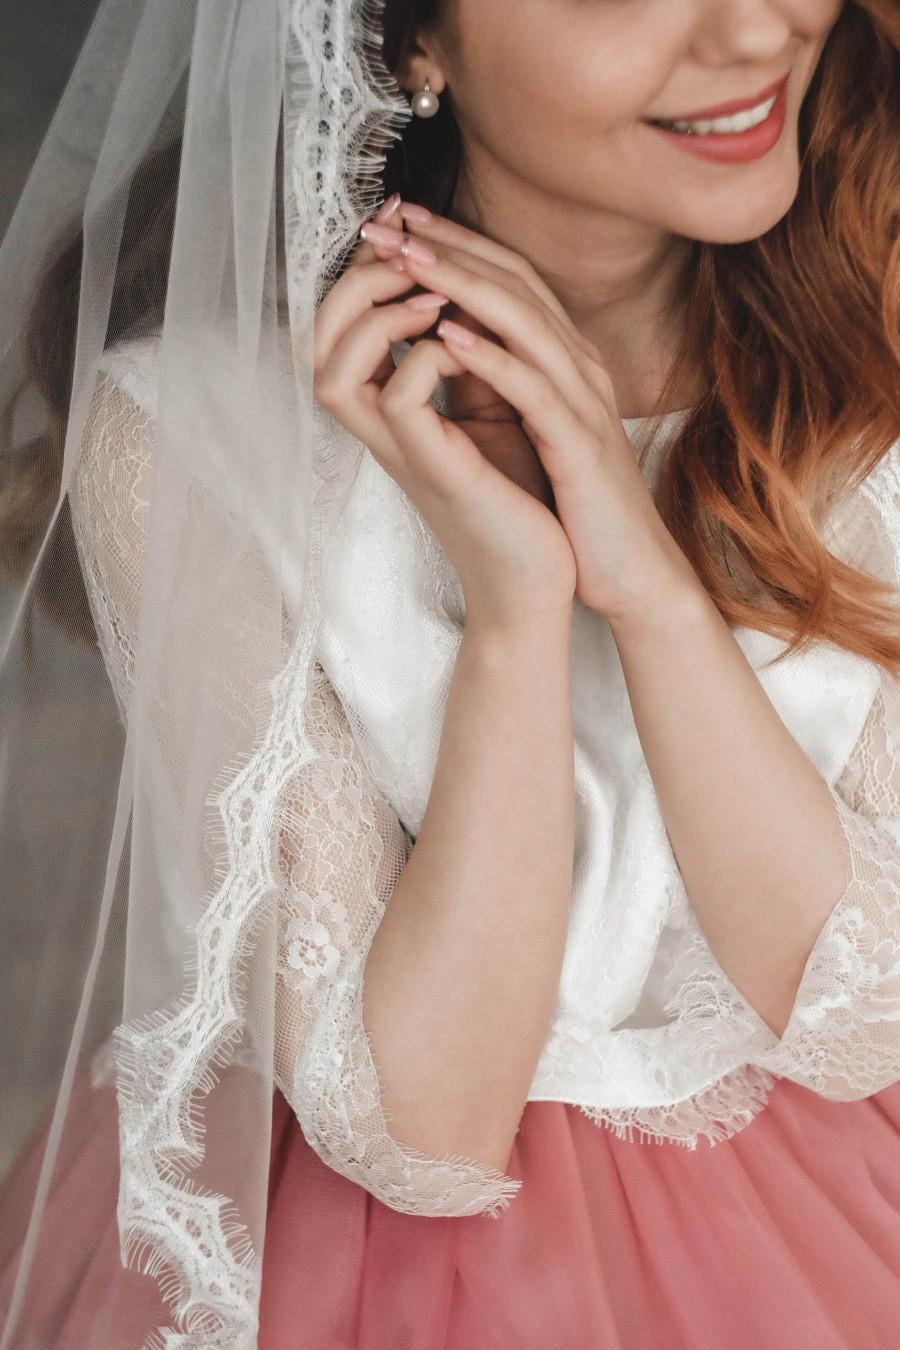 Wedding - Lace eyelash veil, Wedding veil, Bridal veil, Lace veil, Veil wedding, Veil with lace